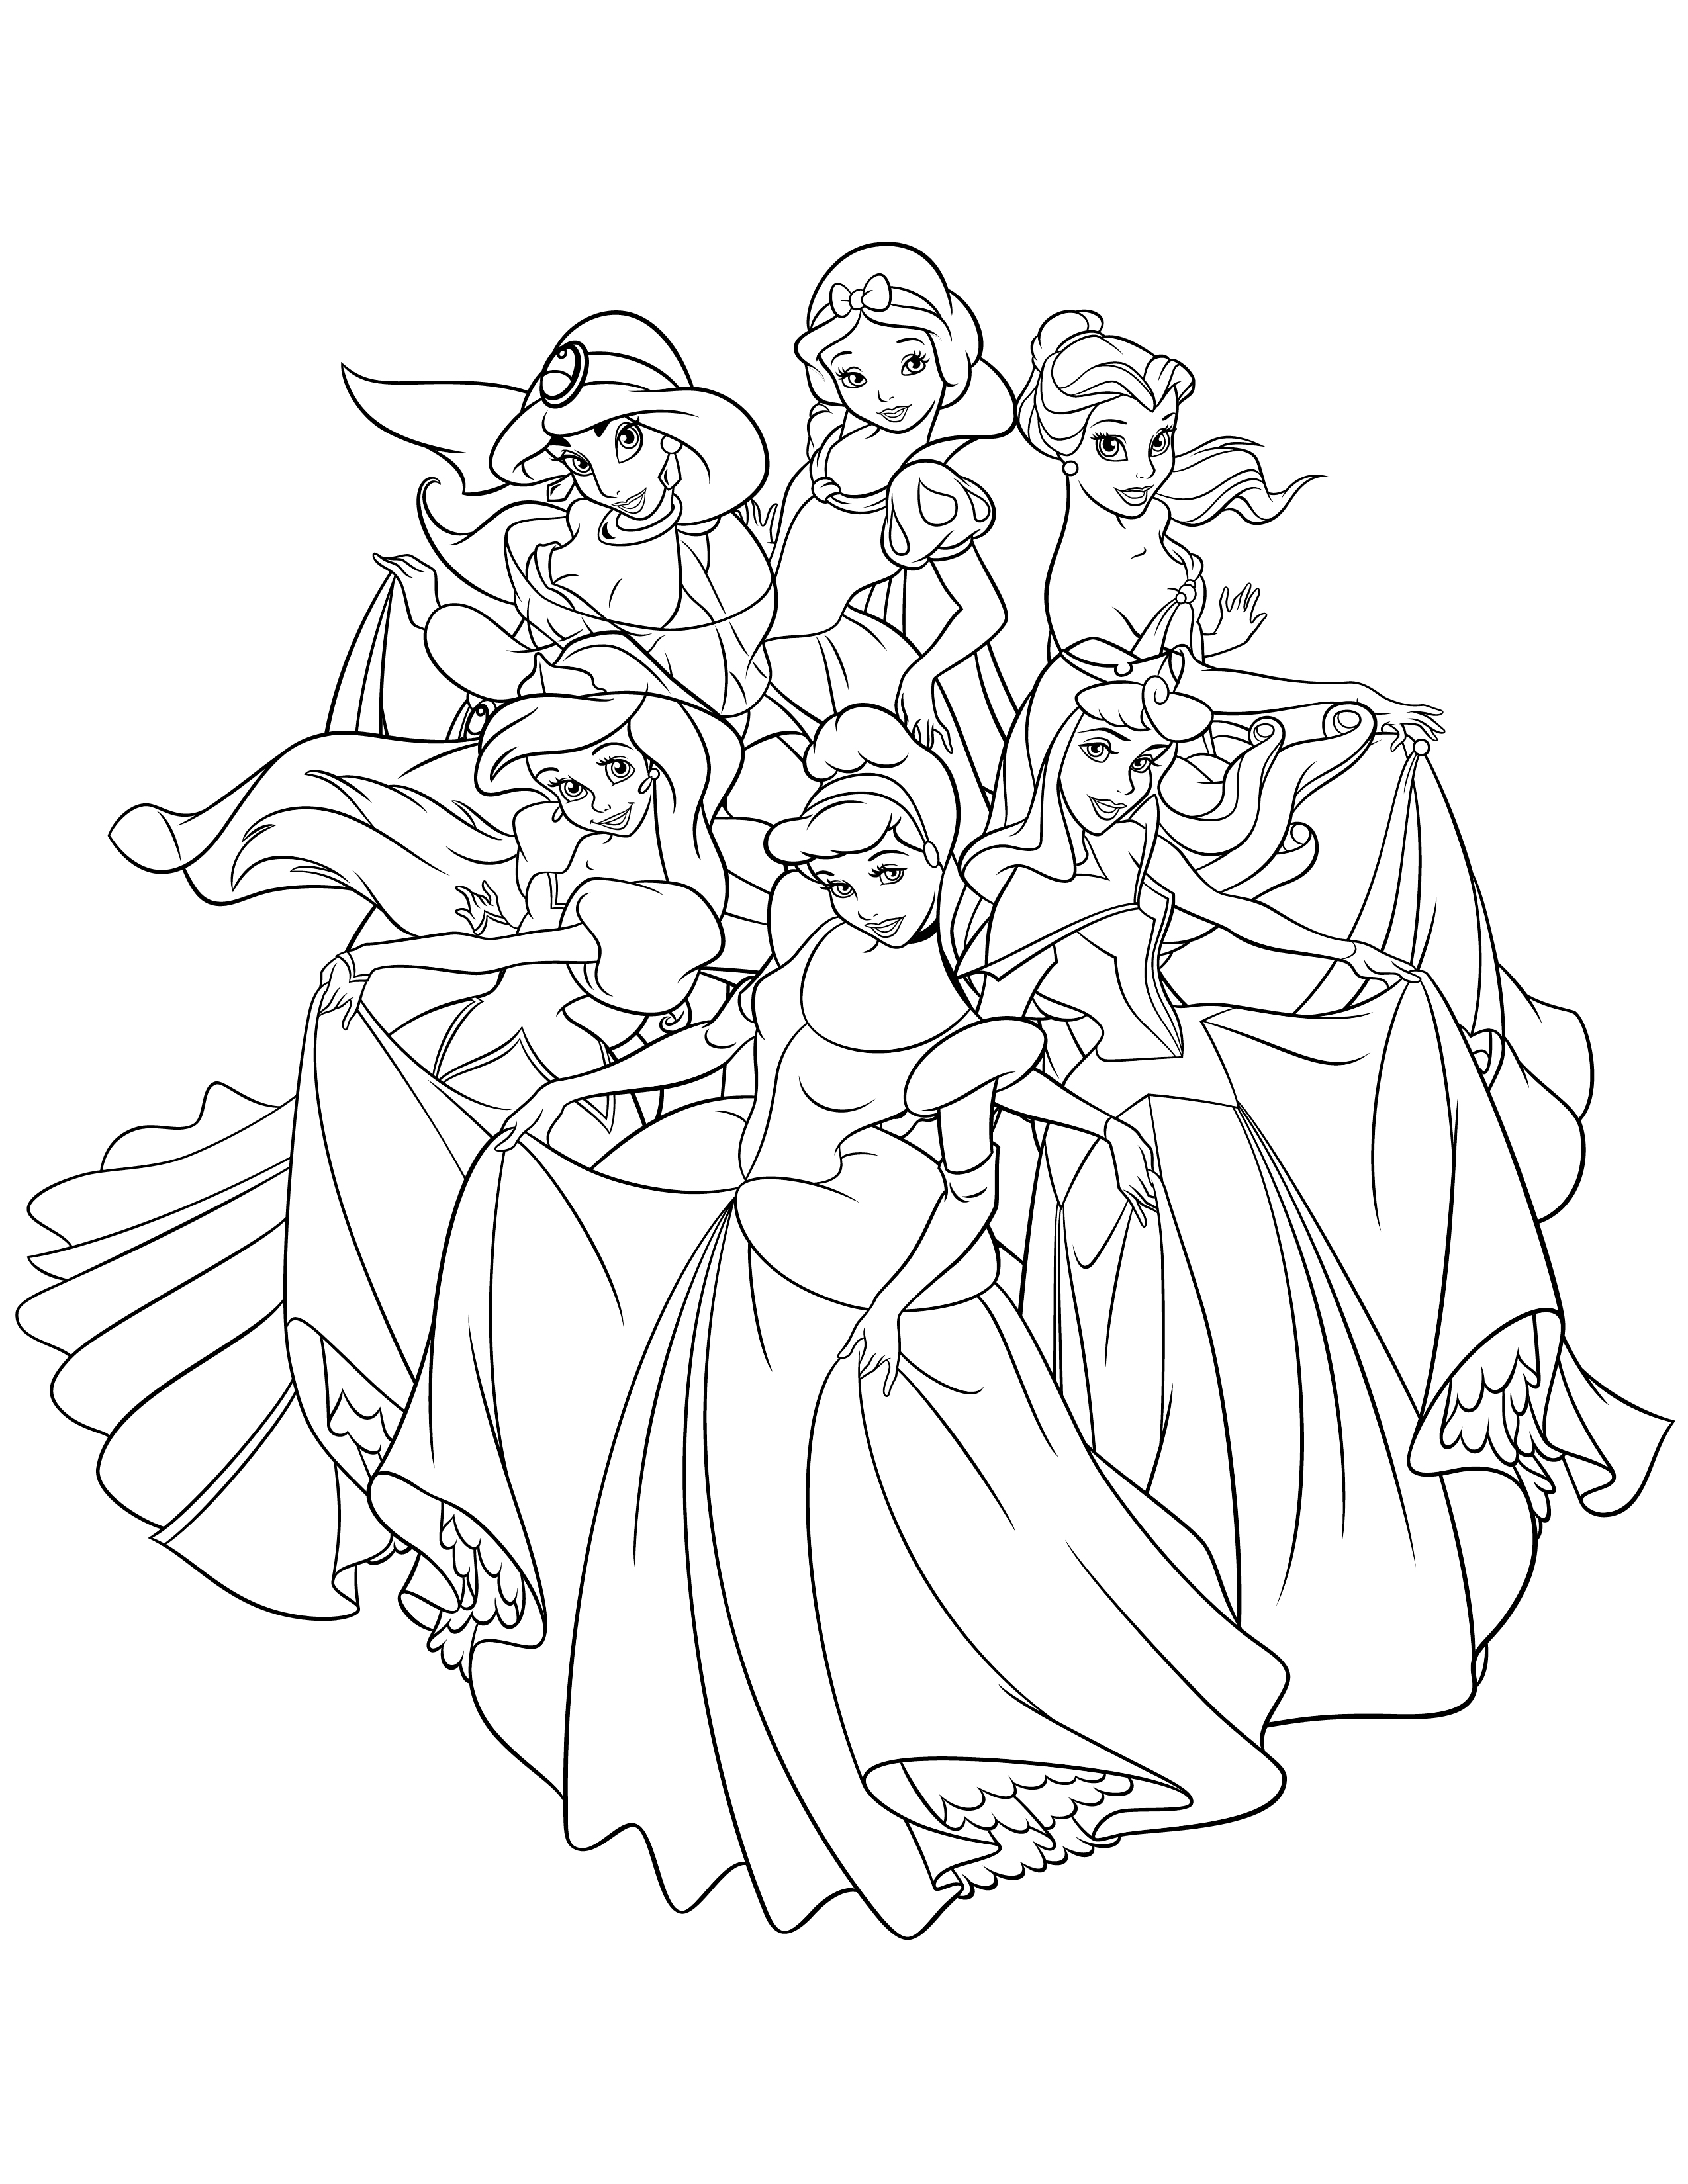 Coloriage princesses disney avec modele - Coloriage dysney ...